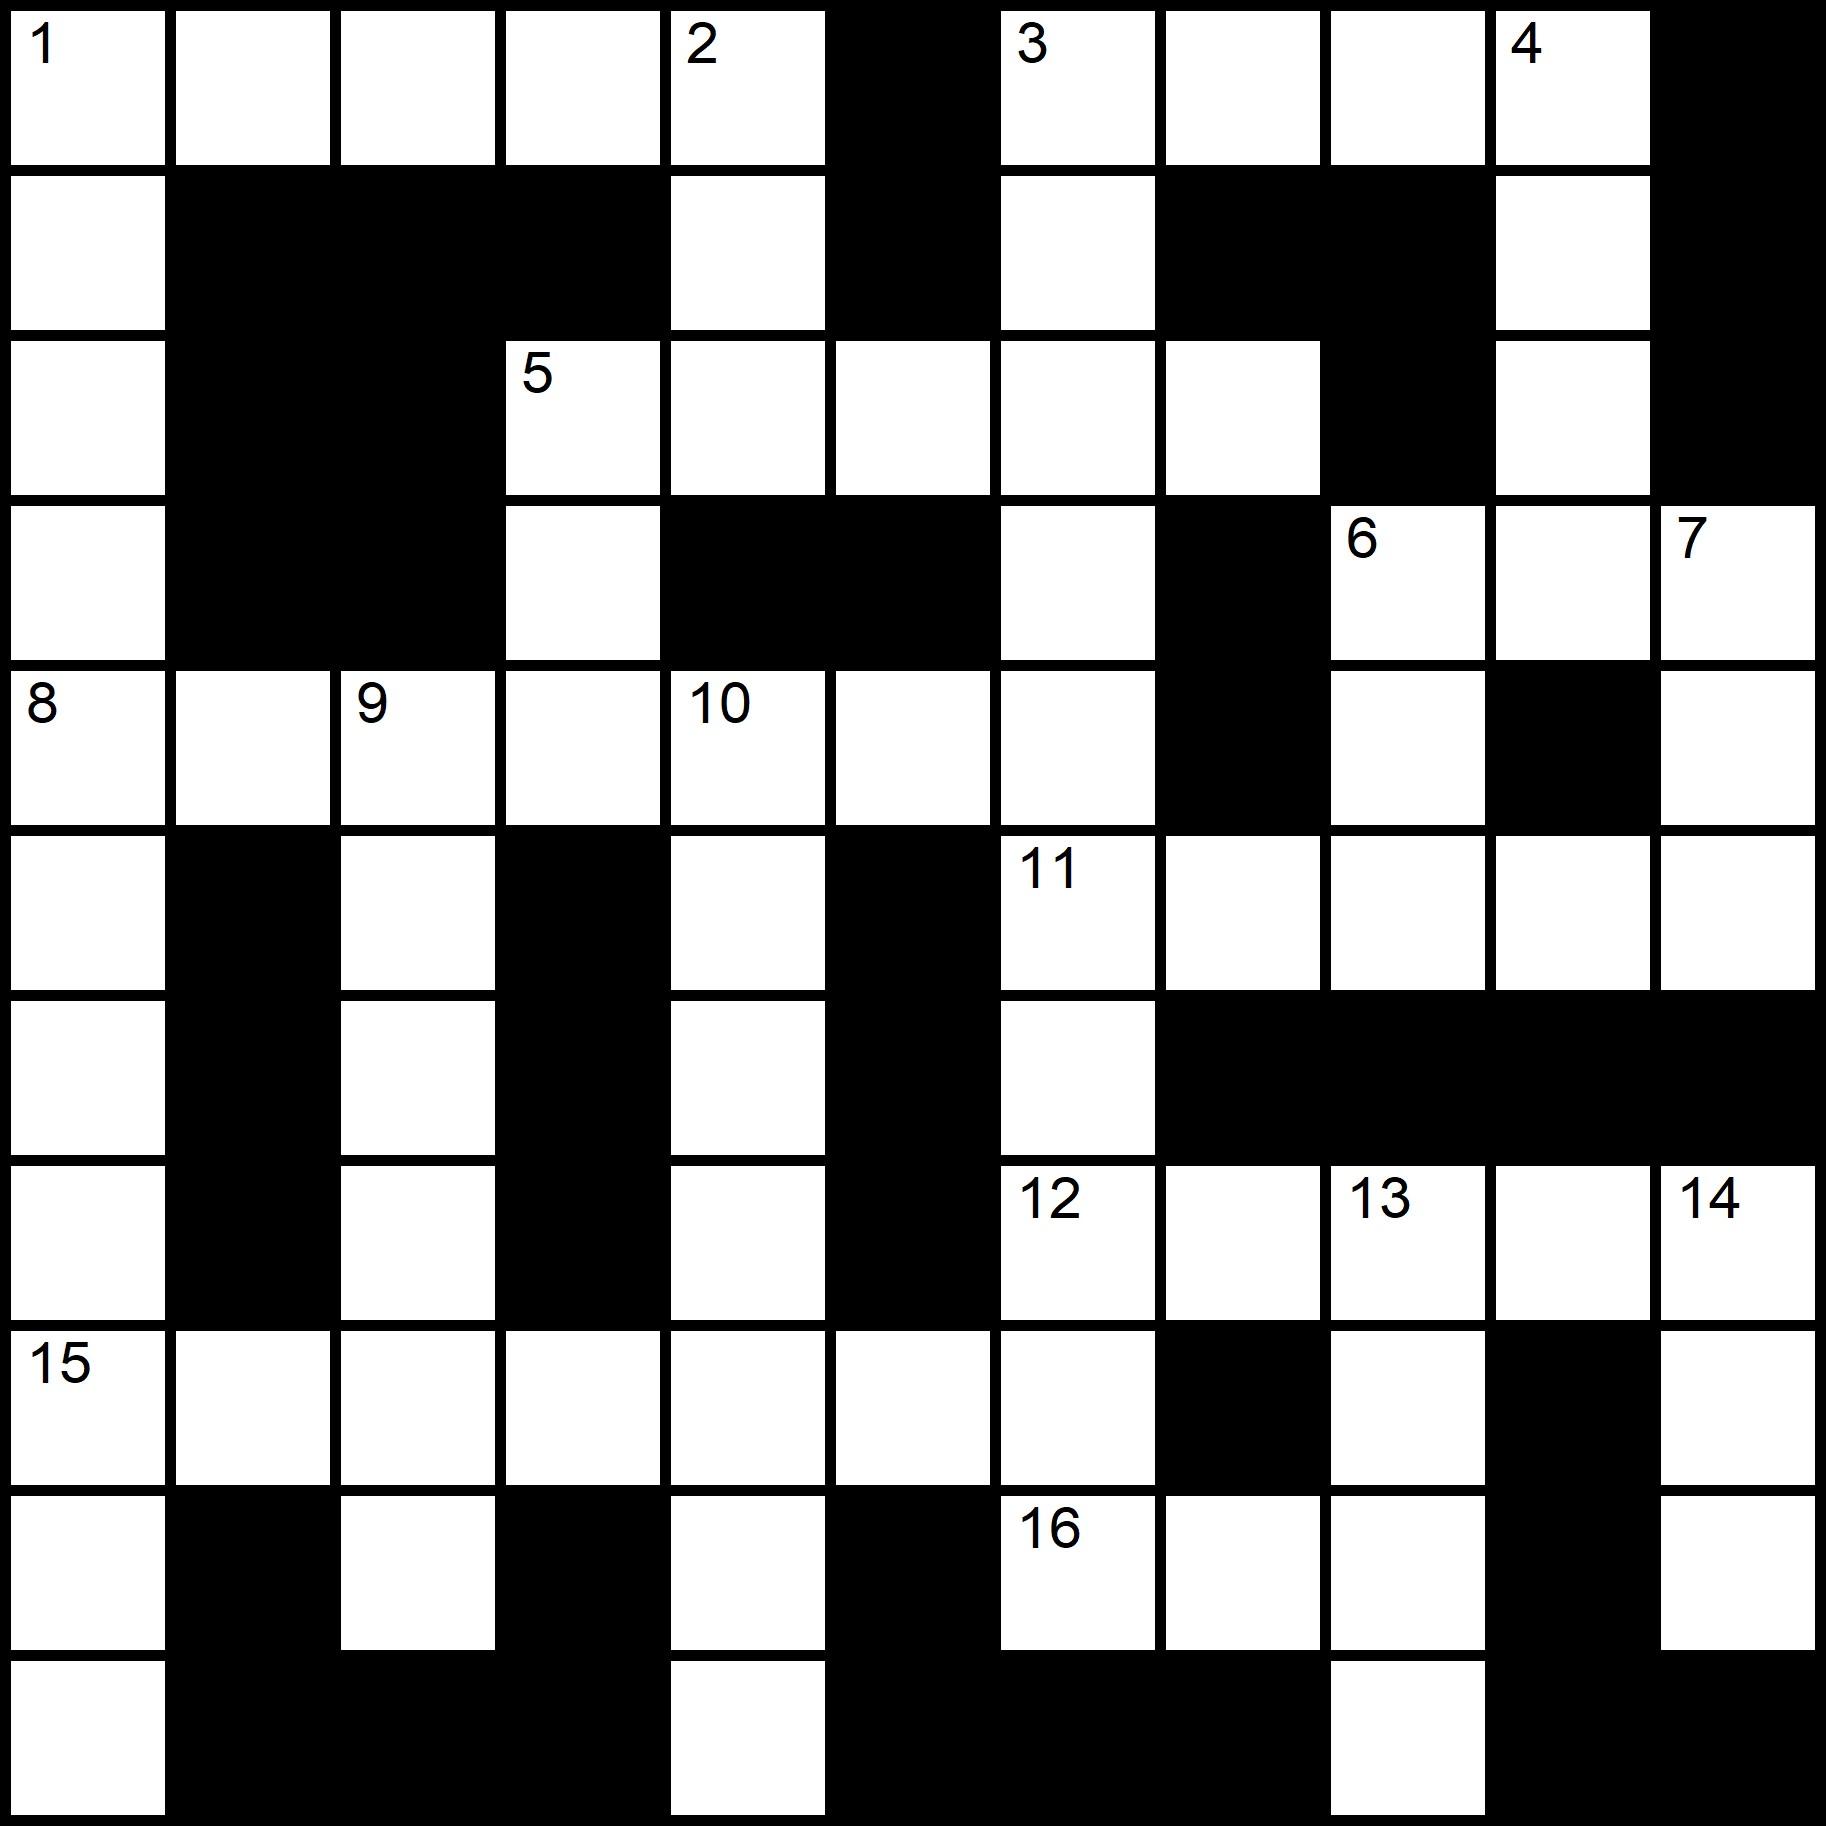 Easy Crosswords Printable - Placidus Flora - Crossword number nine